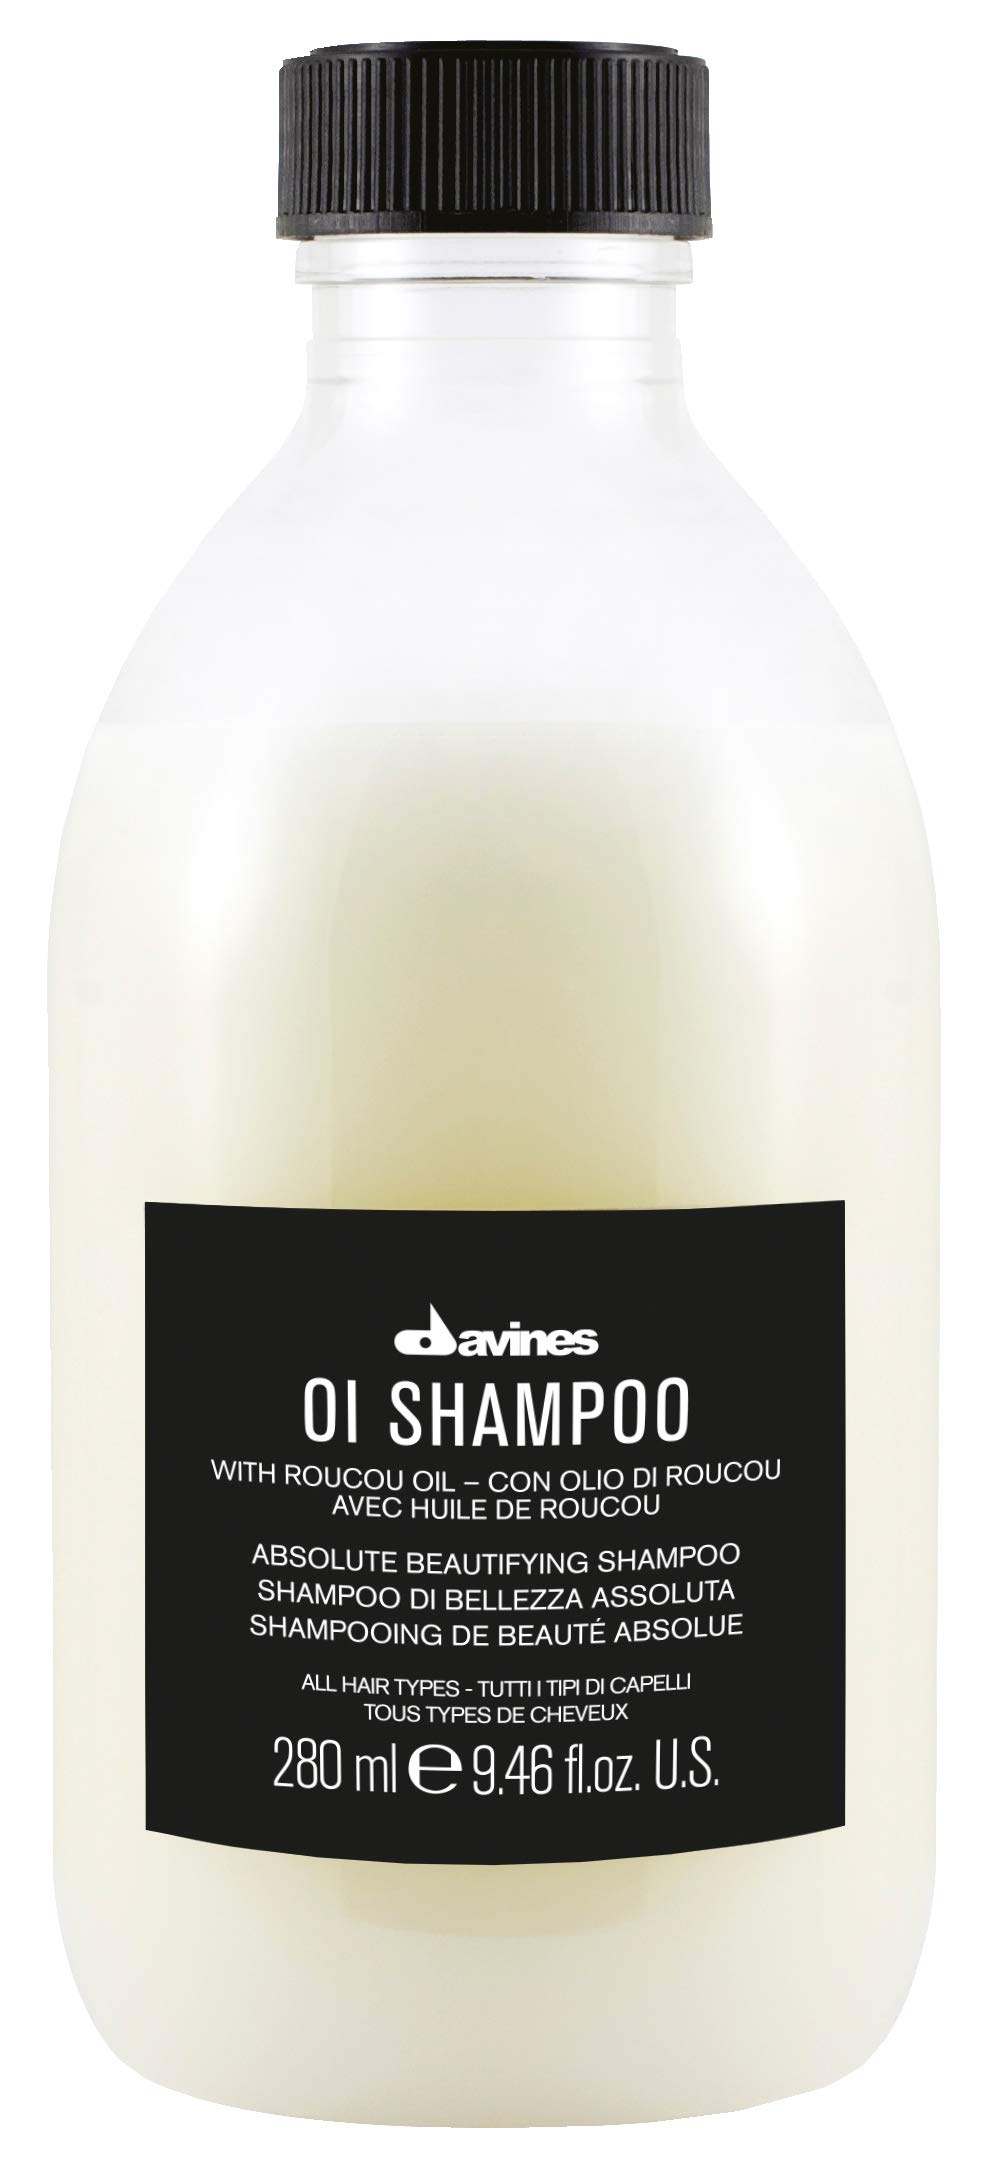 Davines OI Shampoo | Nourishing Shampoo for All Hair Types | Shine, Volume, and Silky-Smooth Hair Everyday | 9.46 Fl Oz